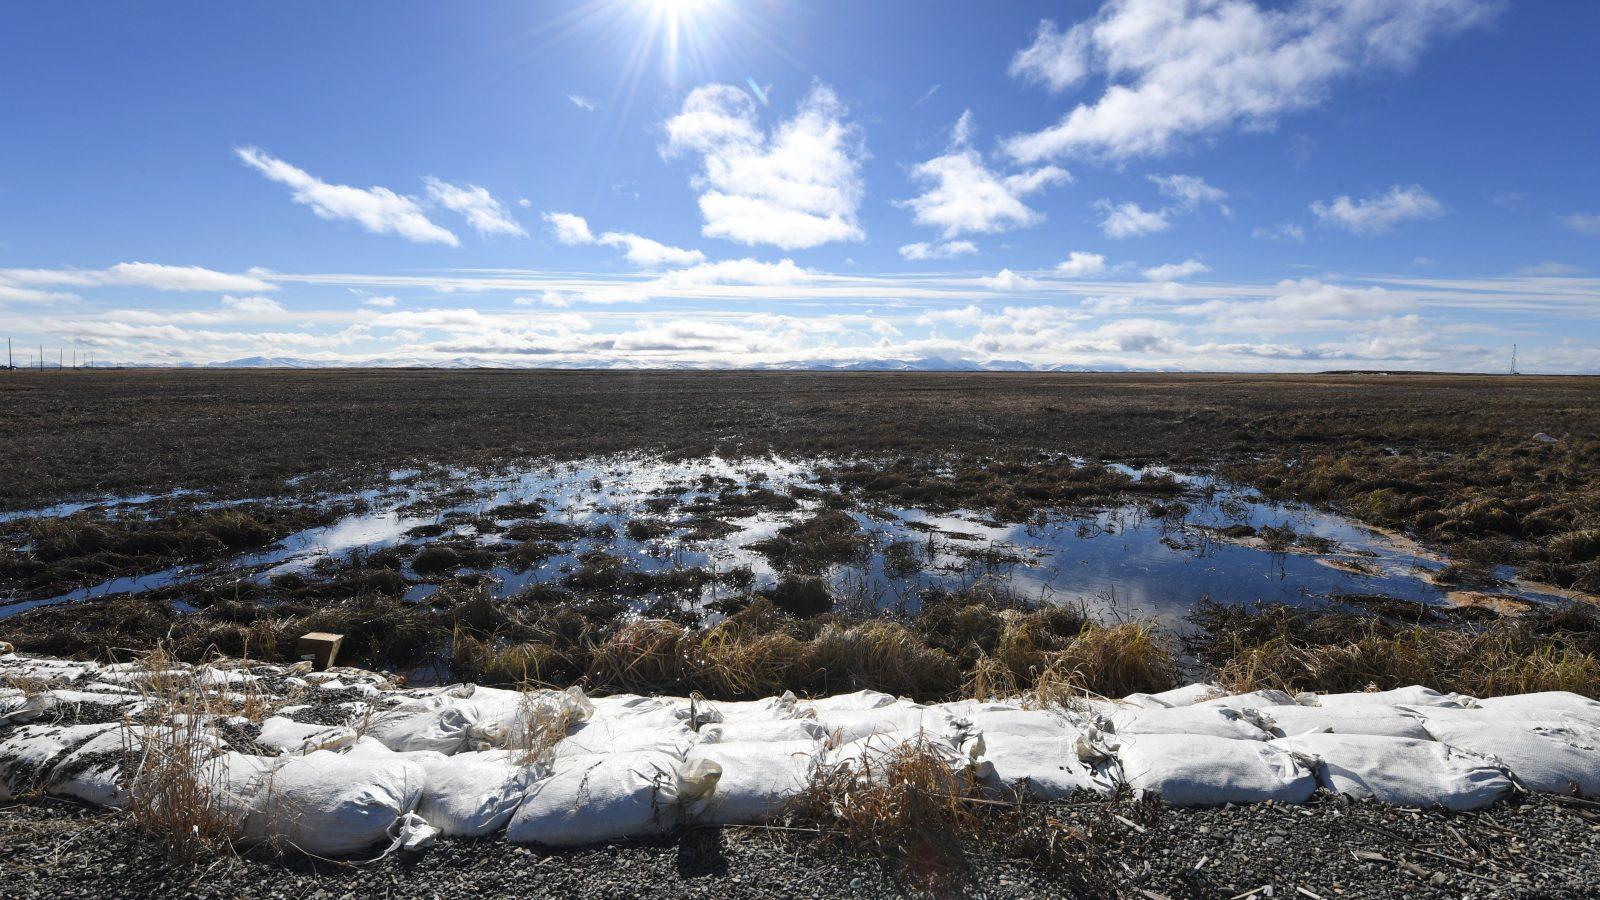 melting permafrost in the Alaska Yukon